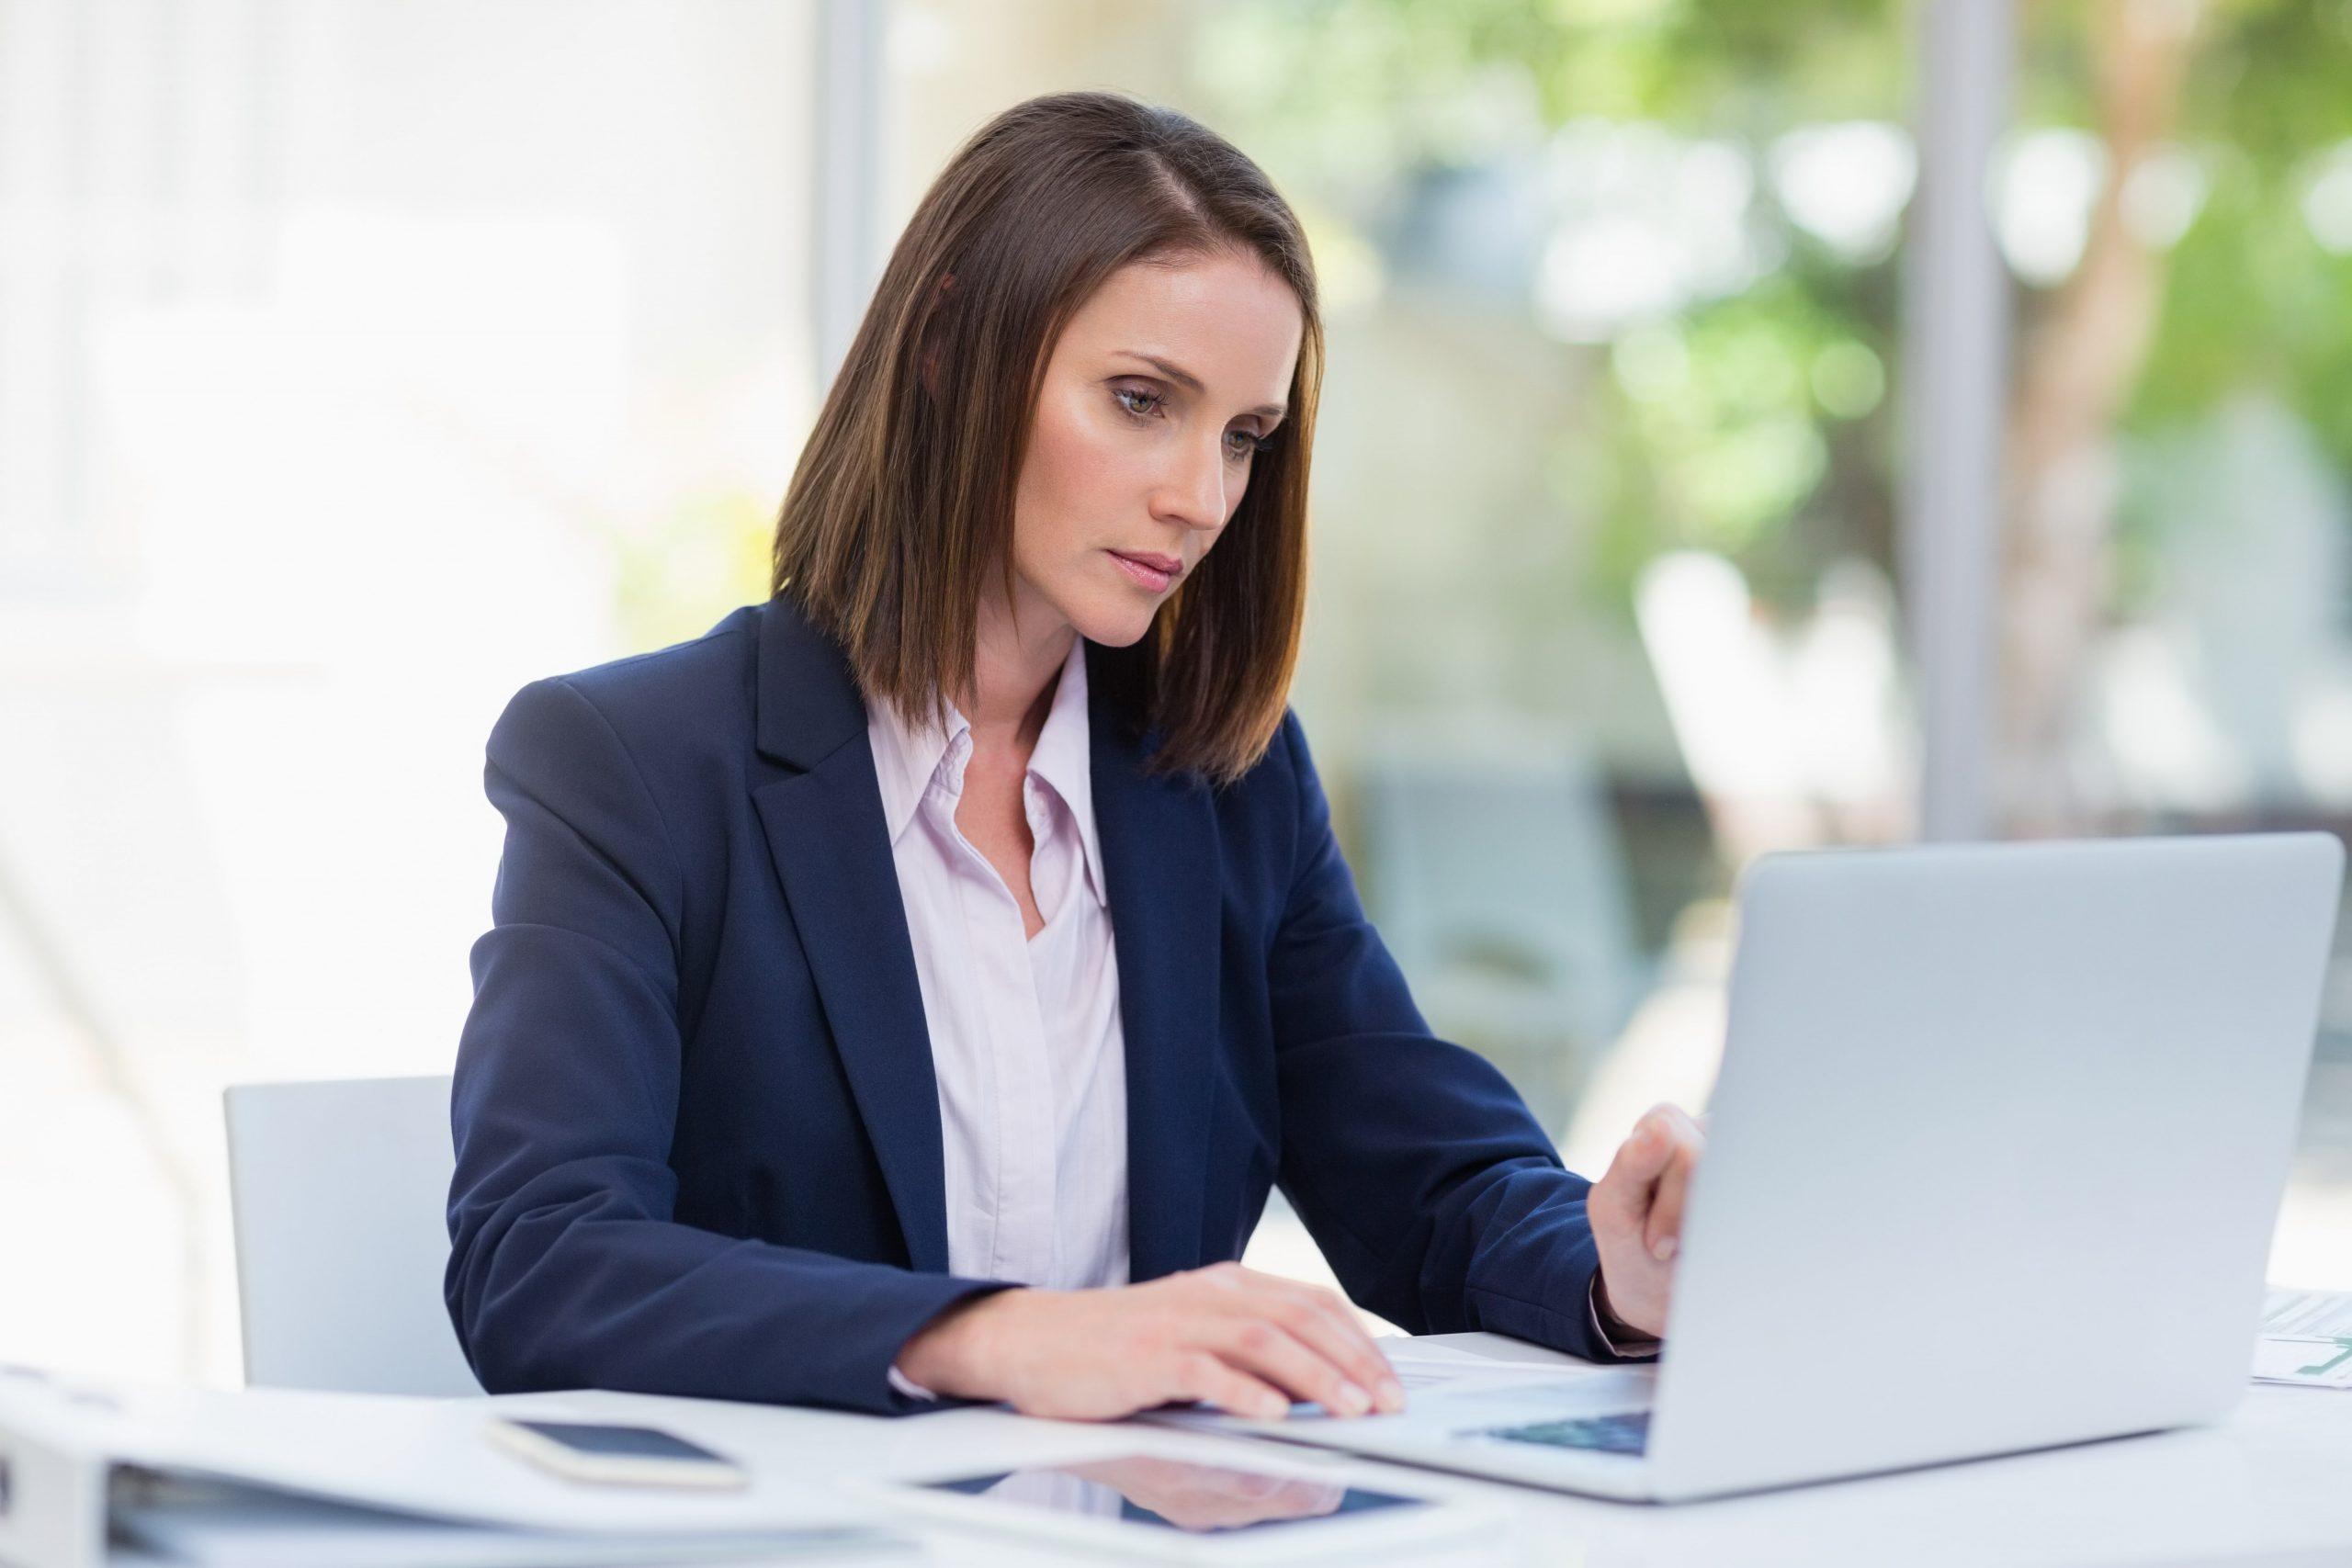 businesswoman-using-laptop-K526UQ9-min